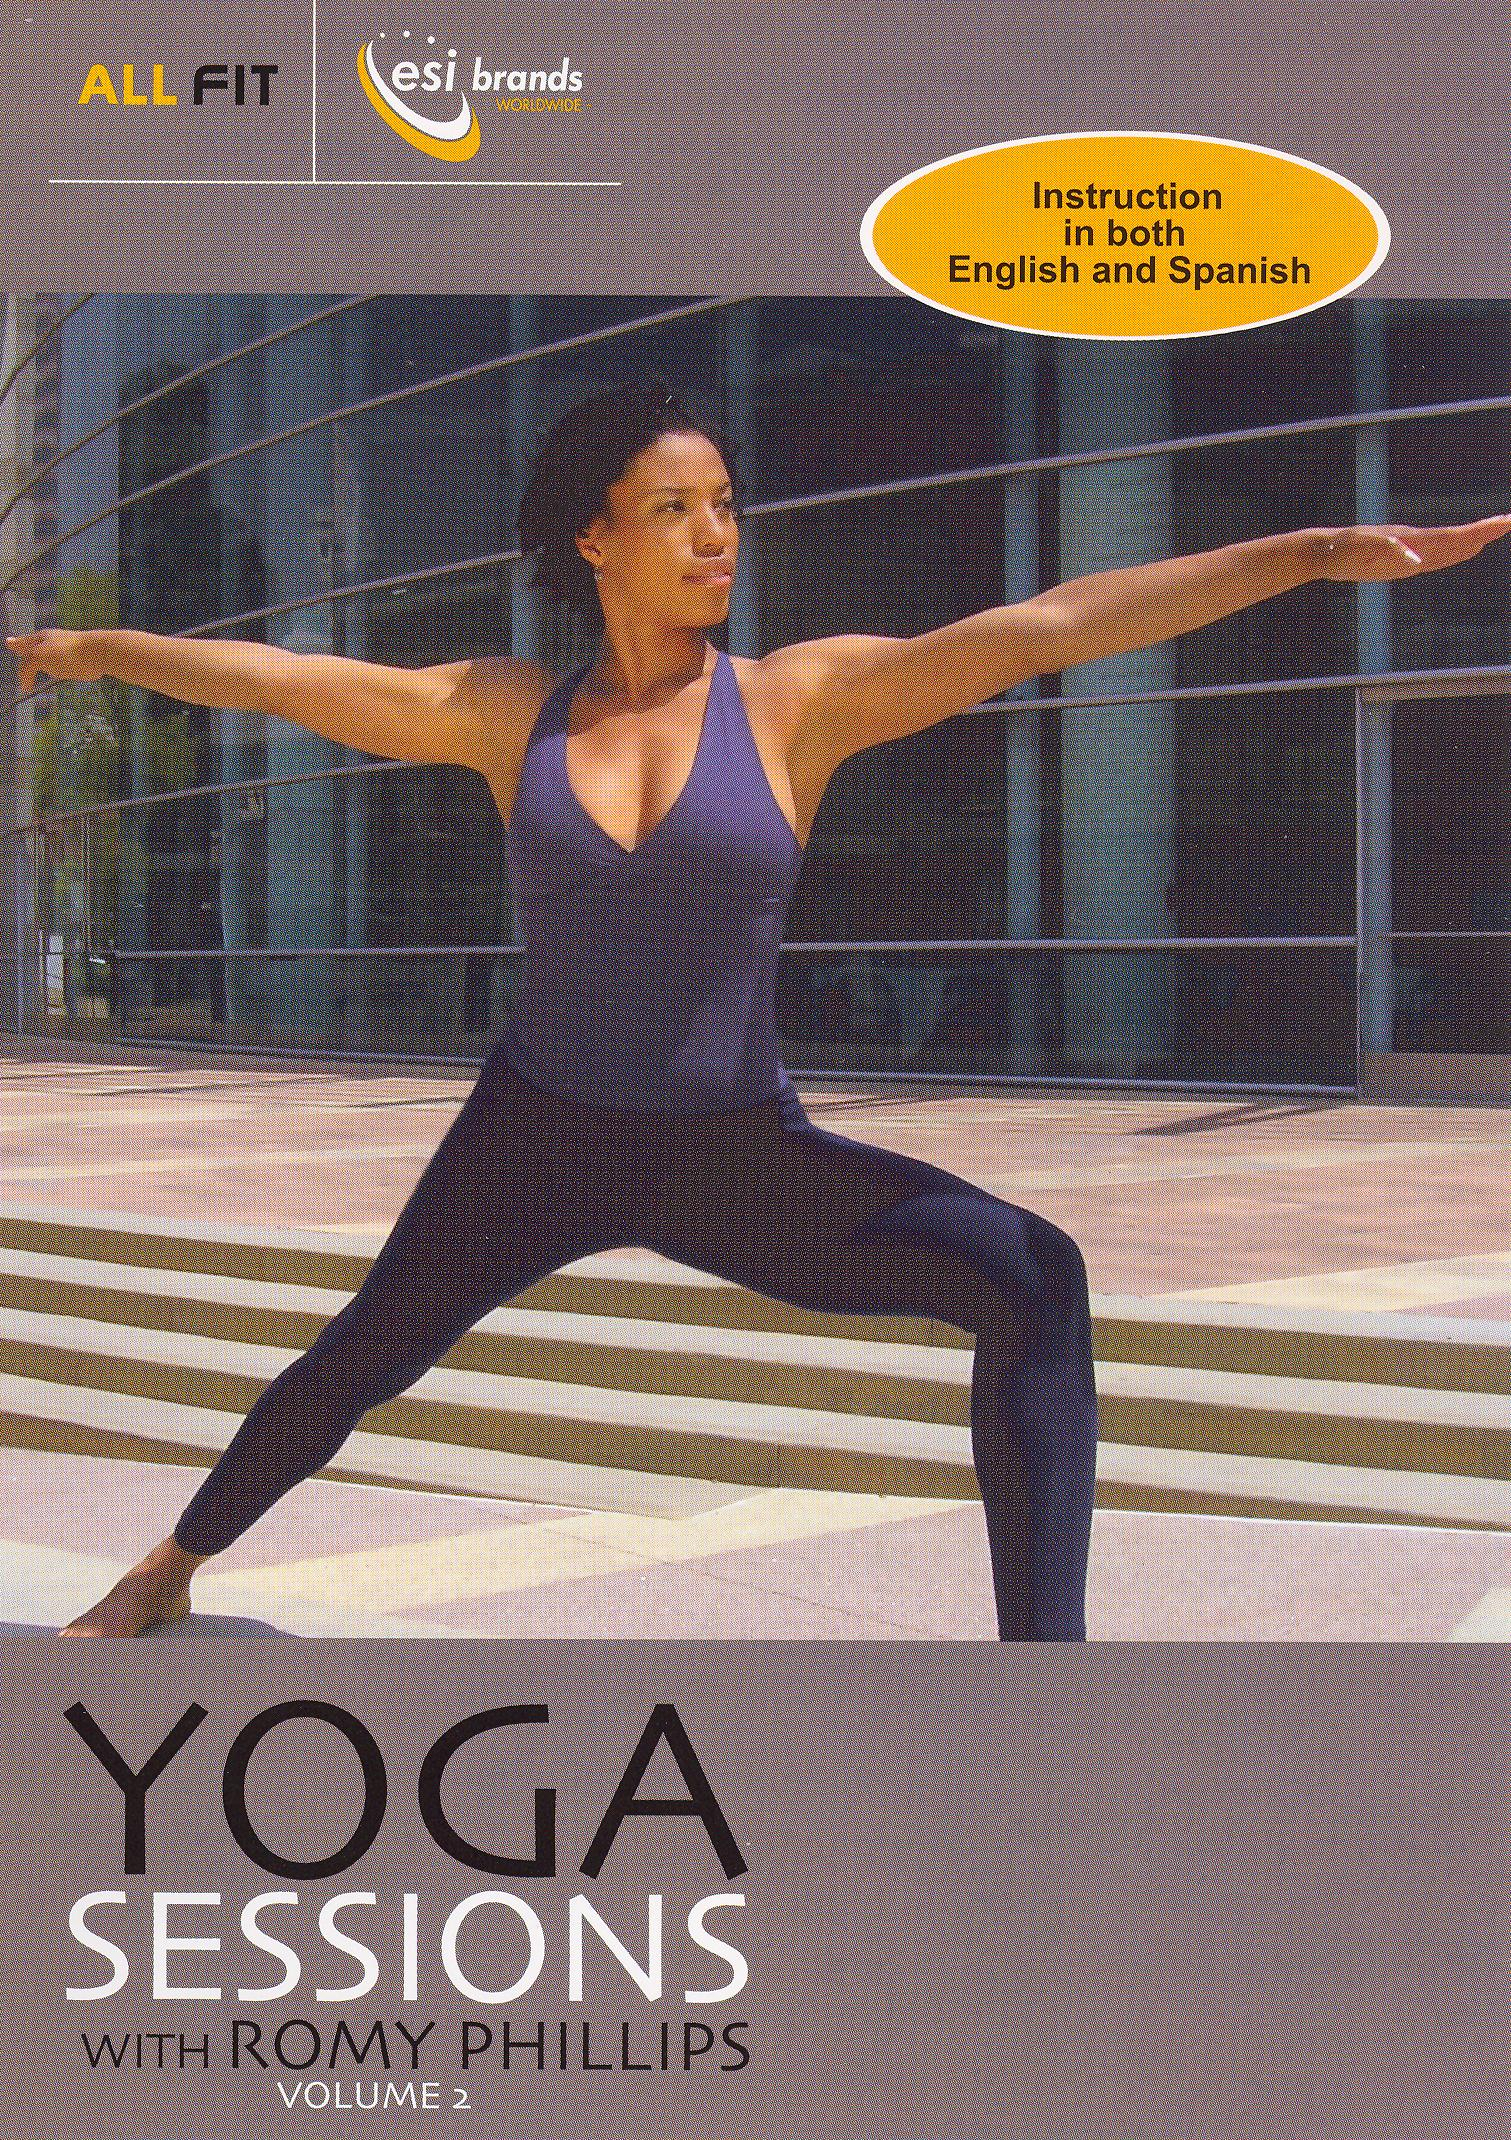 Romy Phillips: Yoga Sessions with Romy Phillips, Vol. 1